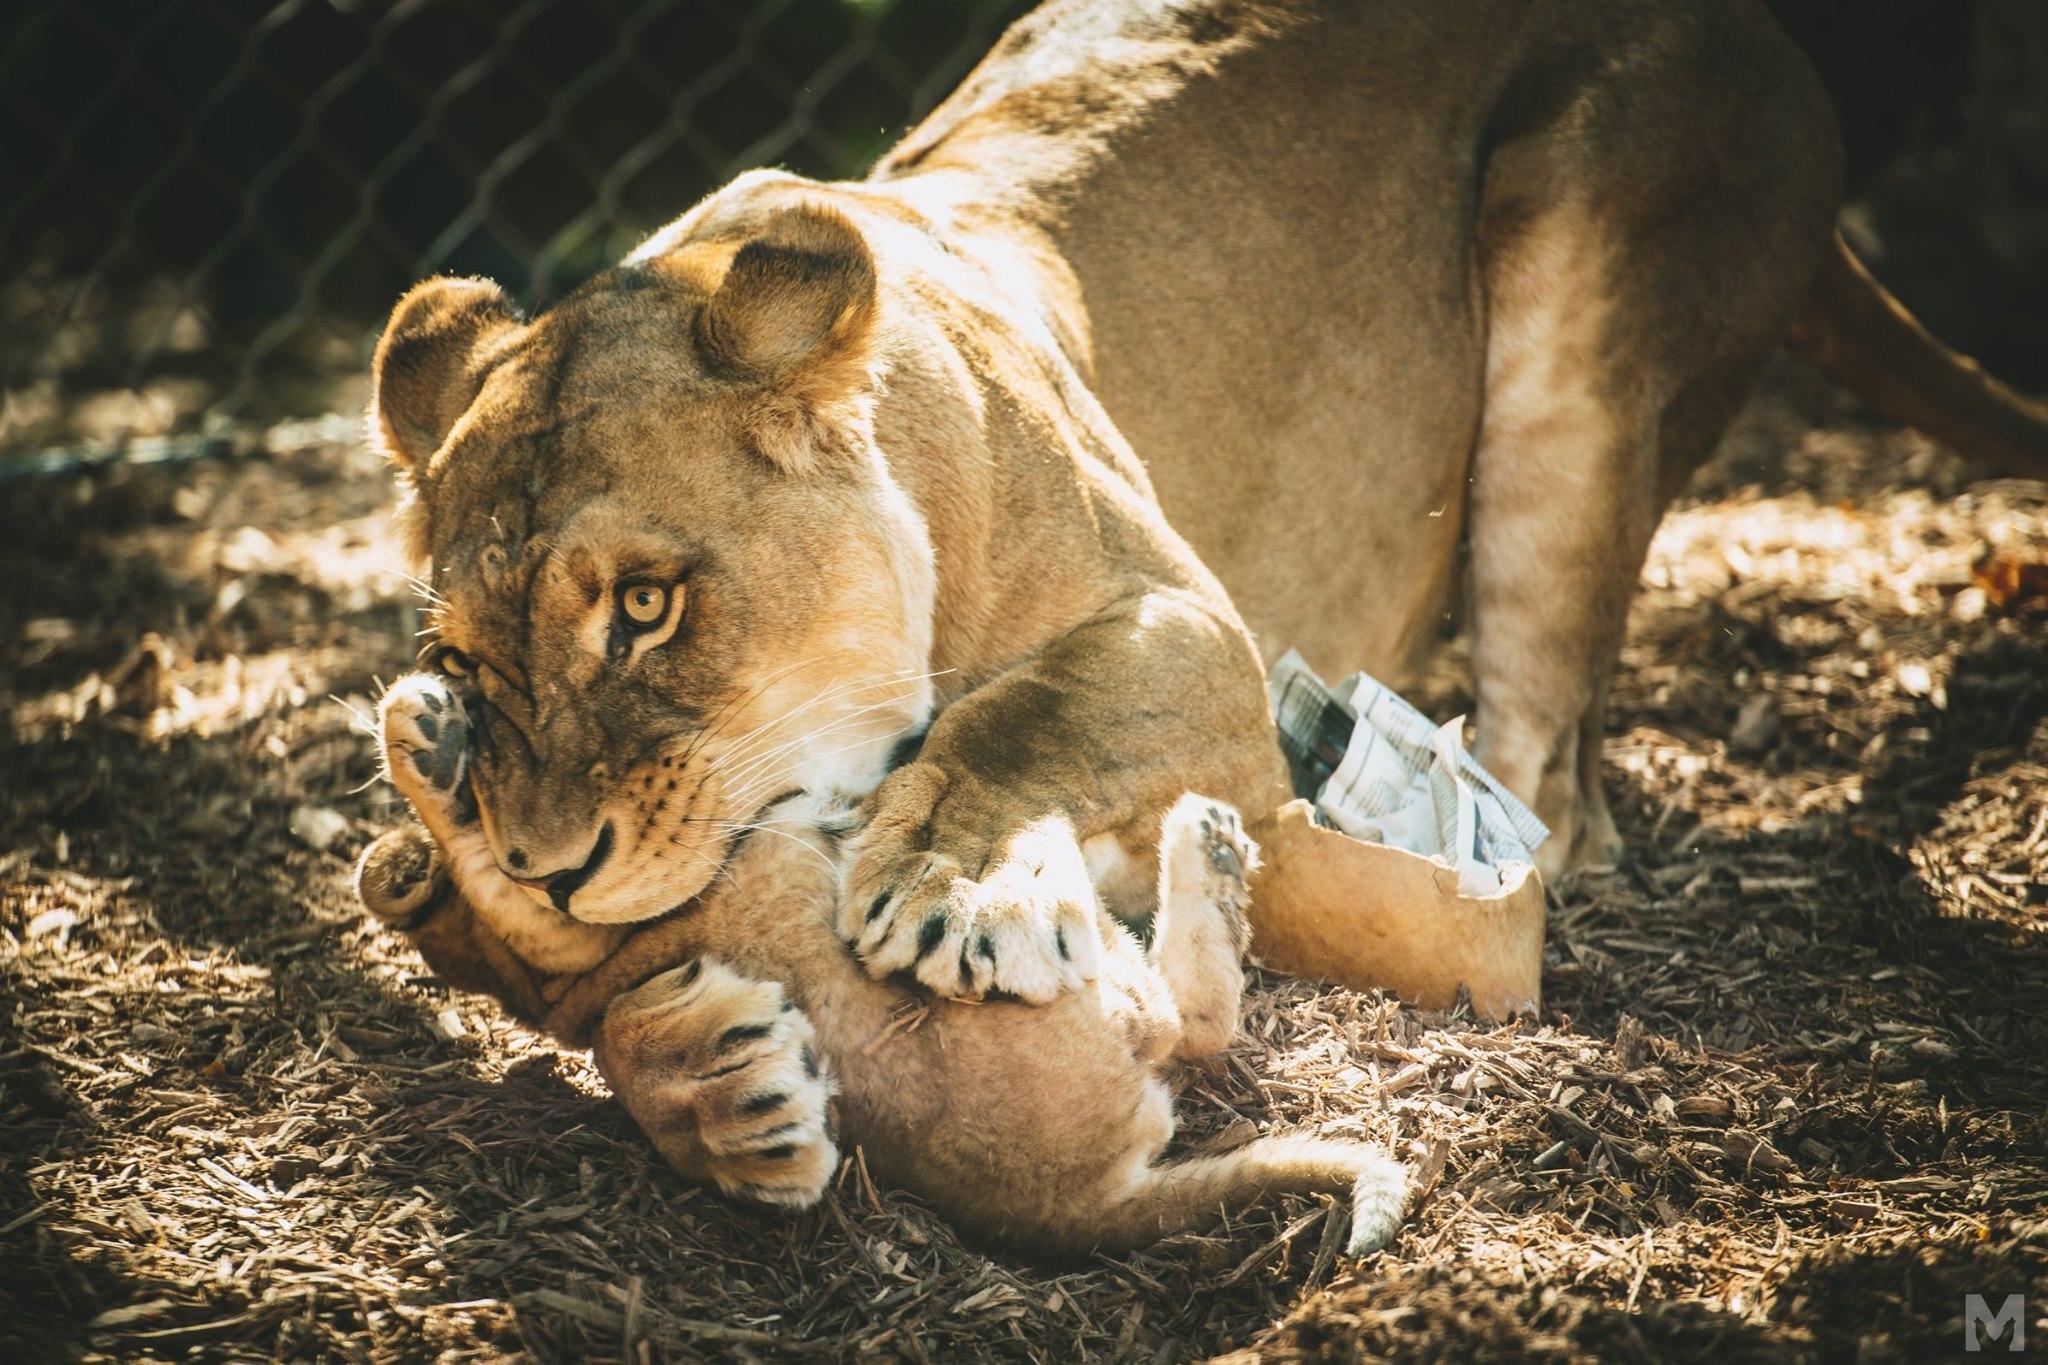 Lion Cub_7_Molly McCormick.jpg